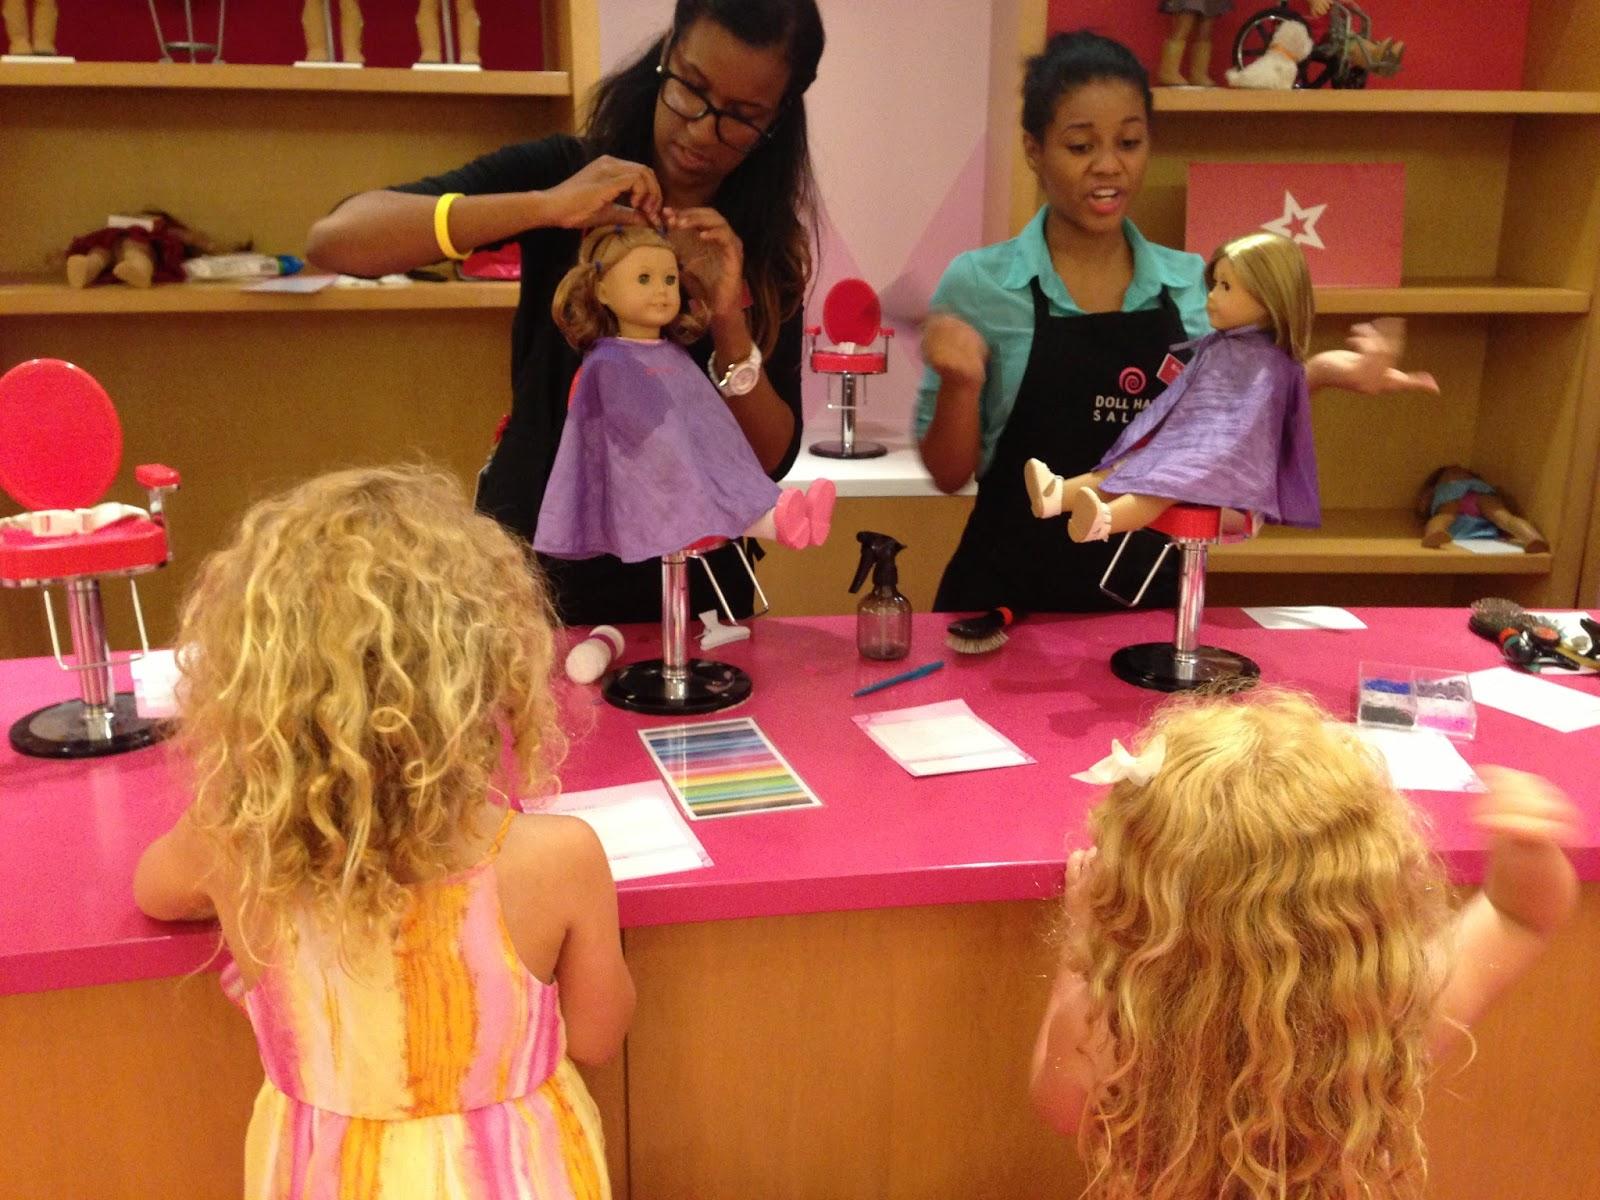 Marvelous Cute American Girl Doll Hairstyles Trends Hairstyle Short Hairstyles Gunalazisus